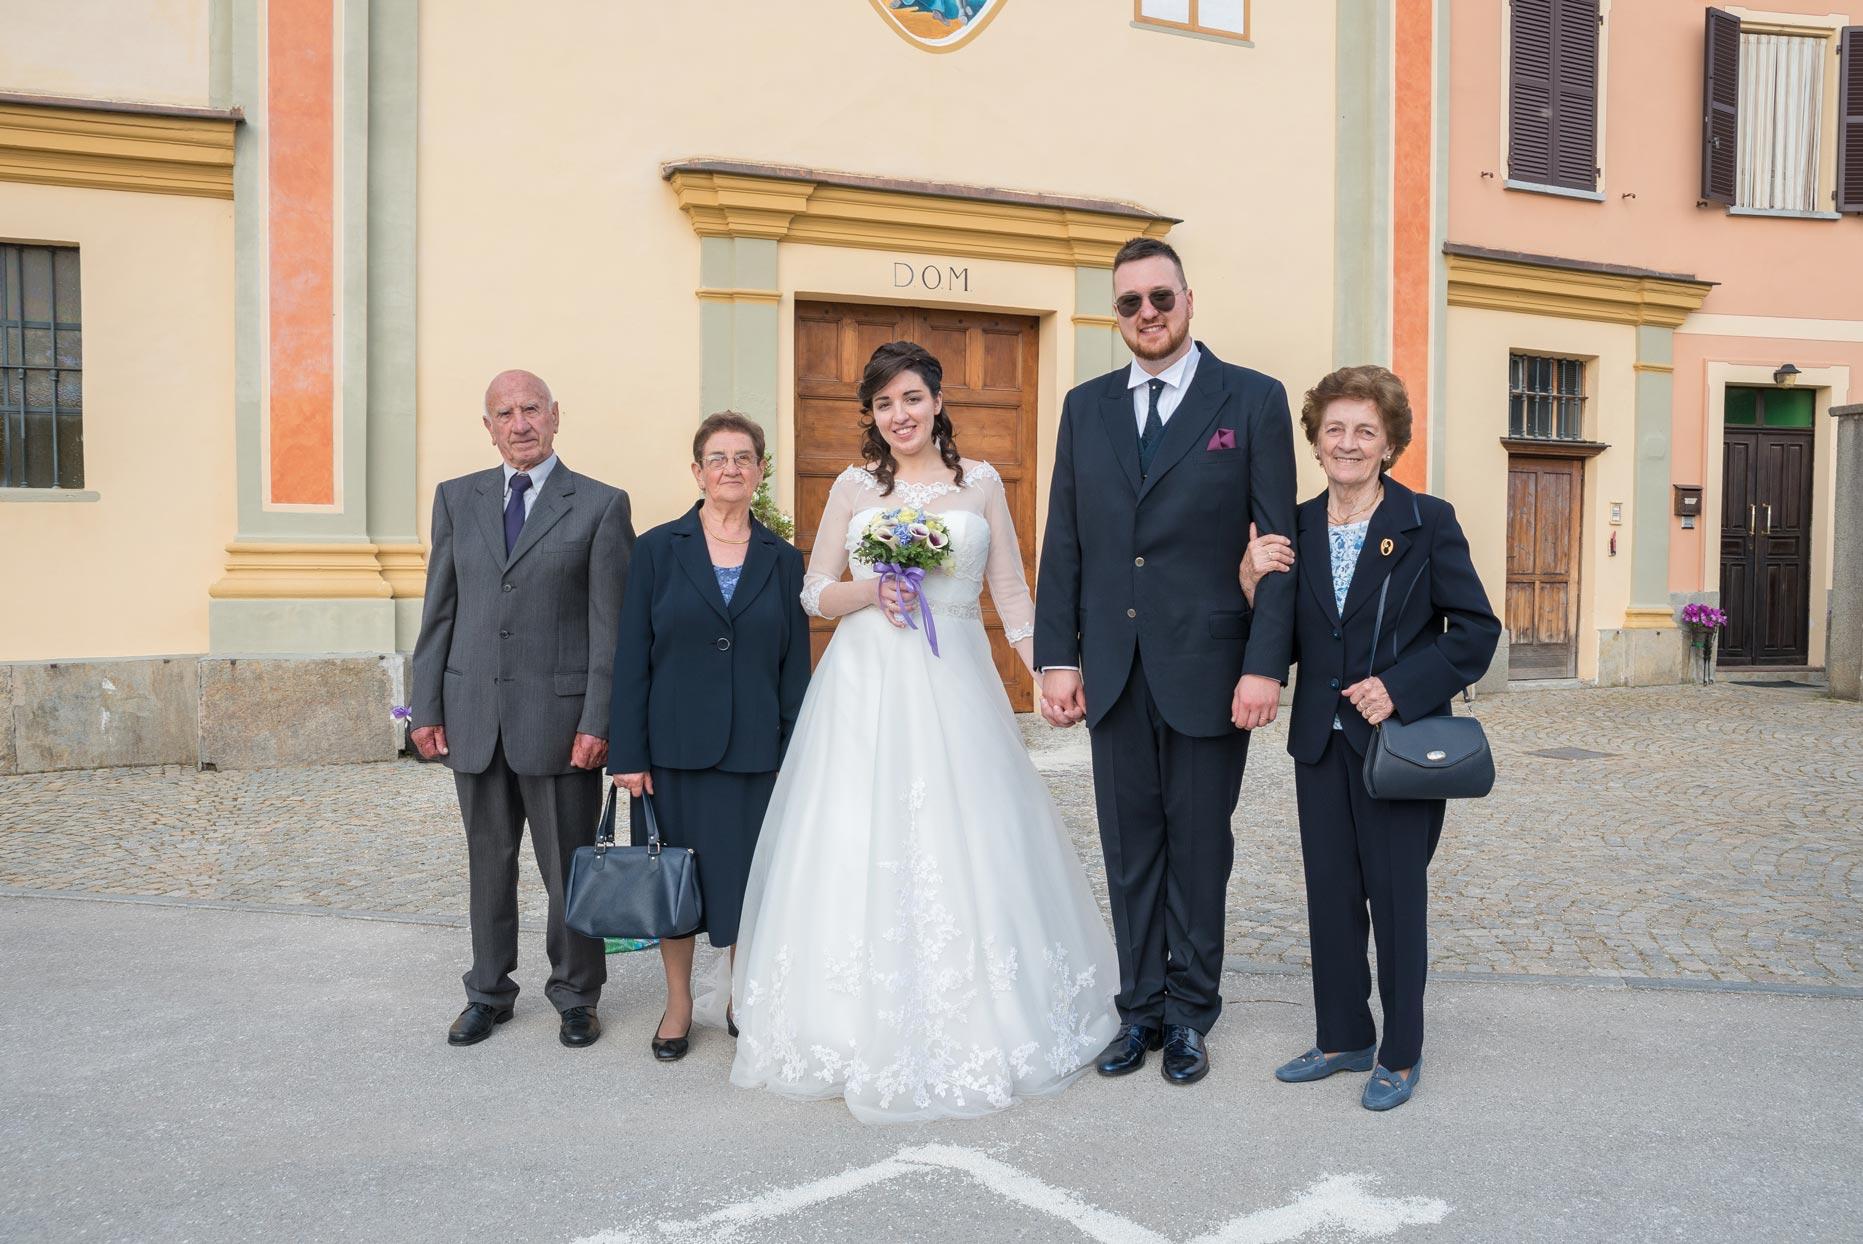 Matrimonio a Narzole Lorenza Diego - DSC 3173 - Fotografie matrimonio parenti - Fotografie matrimonio parenti